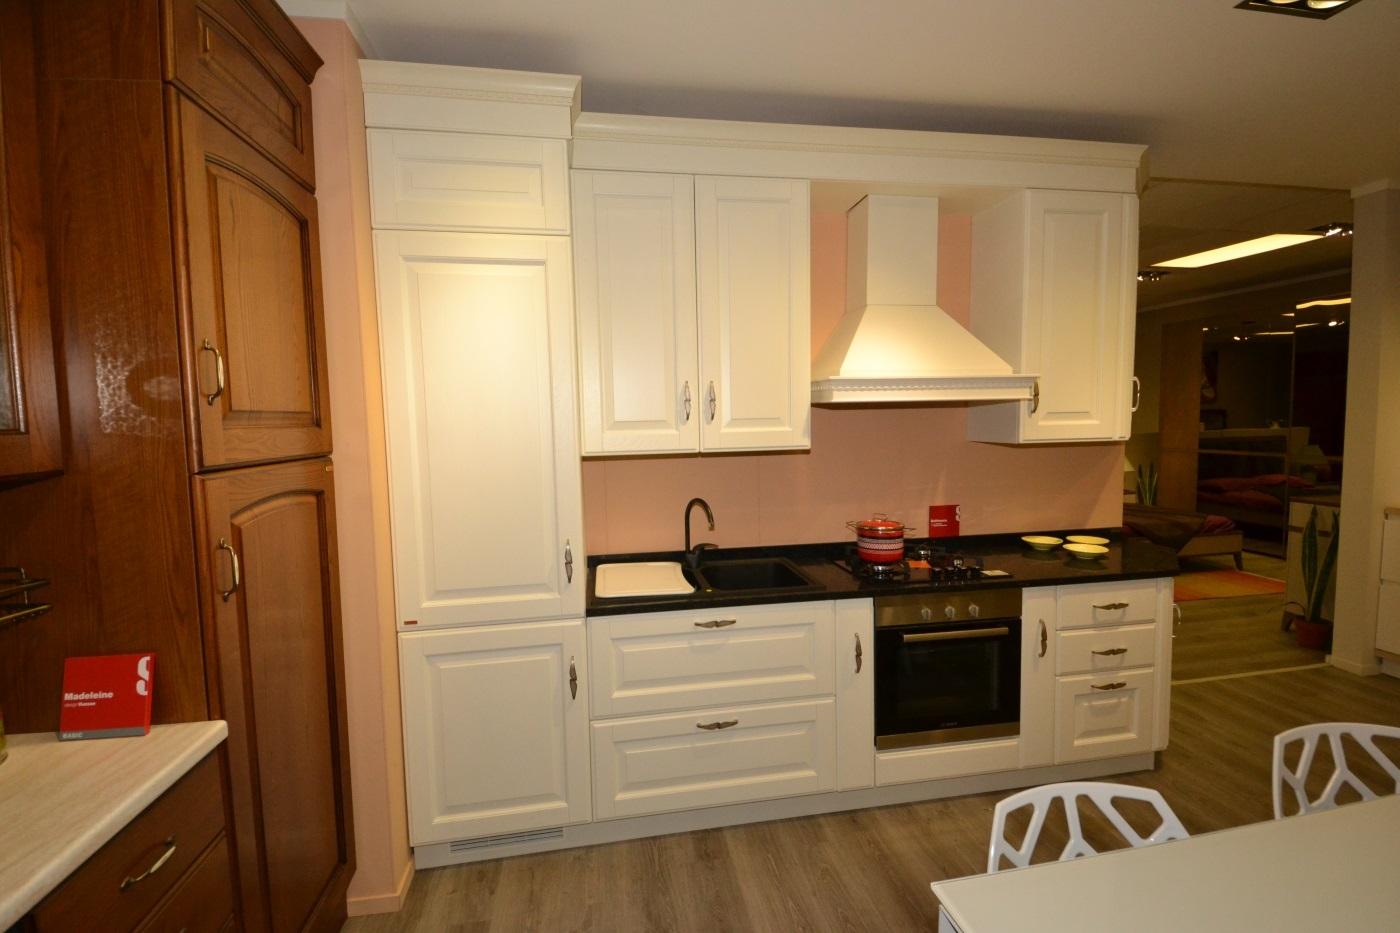 Cucina scavolini baltimora in rovere bianco cucine a - Cucina rovere bianco ...